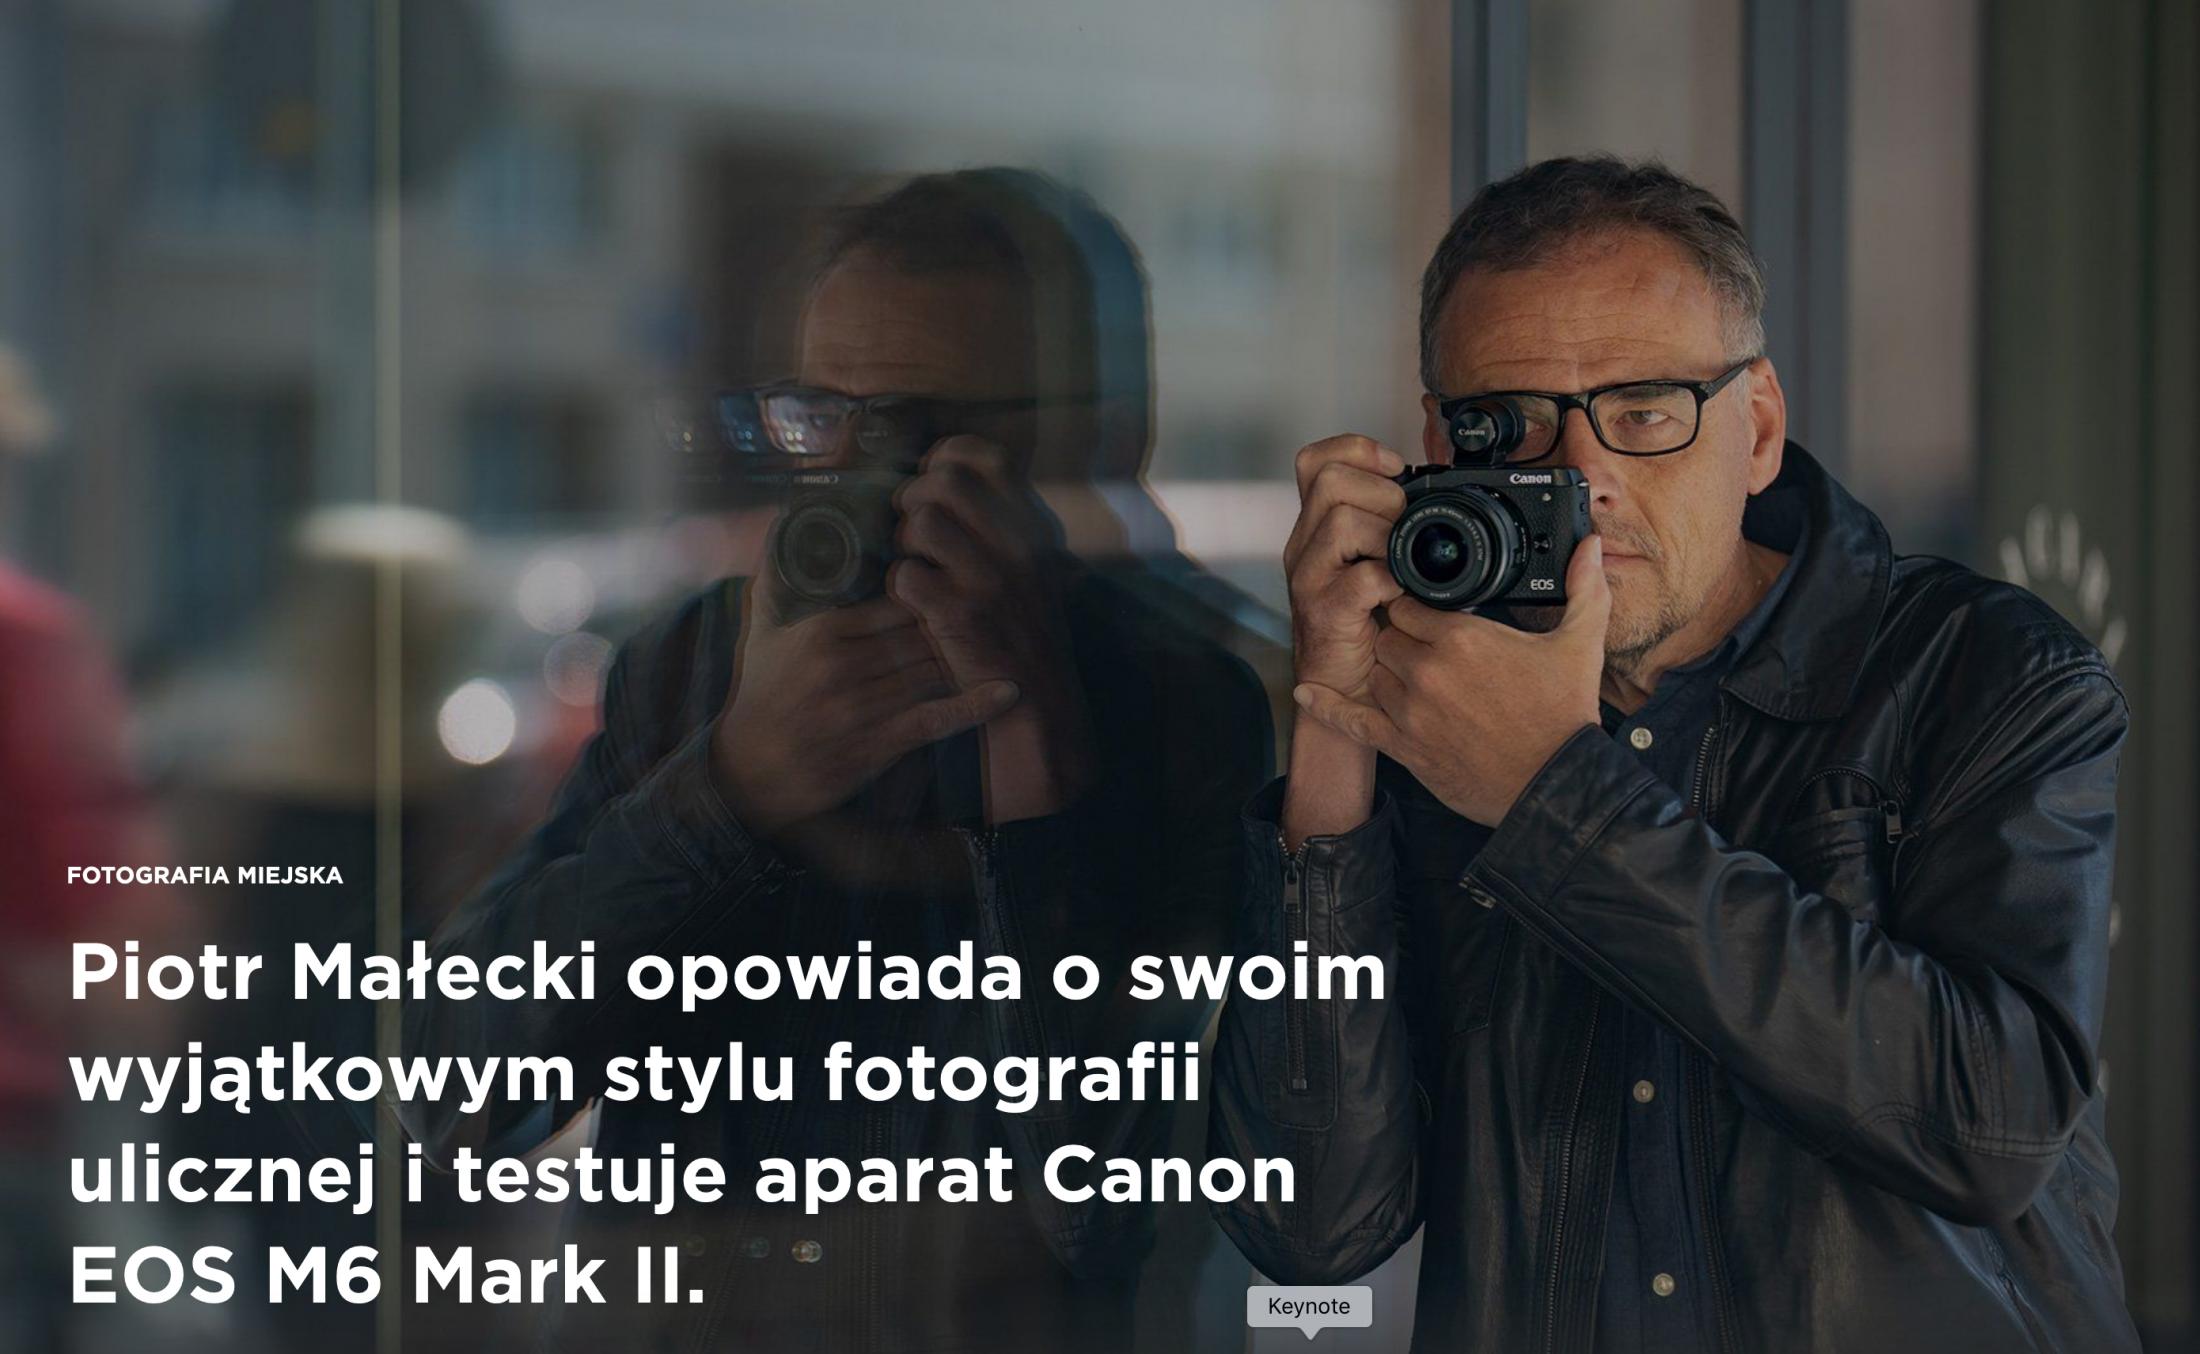 Art and Documentary Photography - Loading Zrzut_ekranu_2020-08-24_o_17.06.13.png